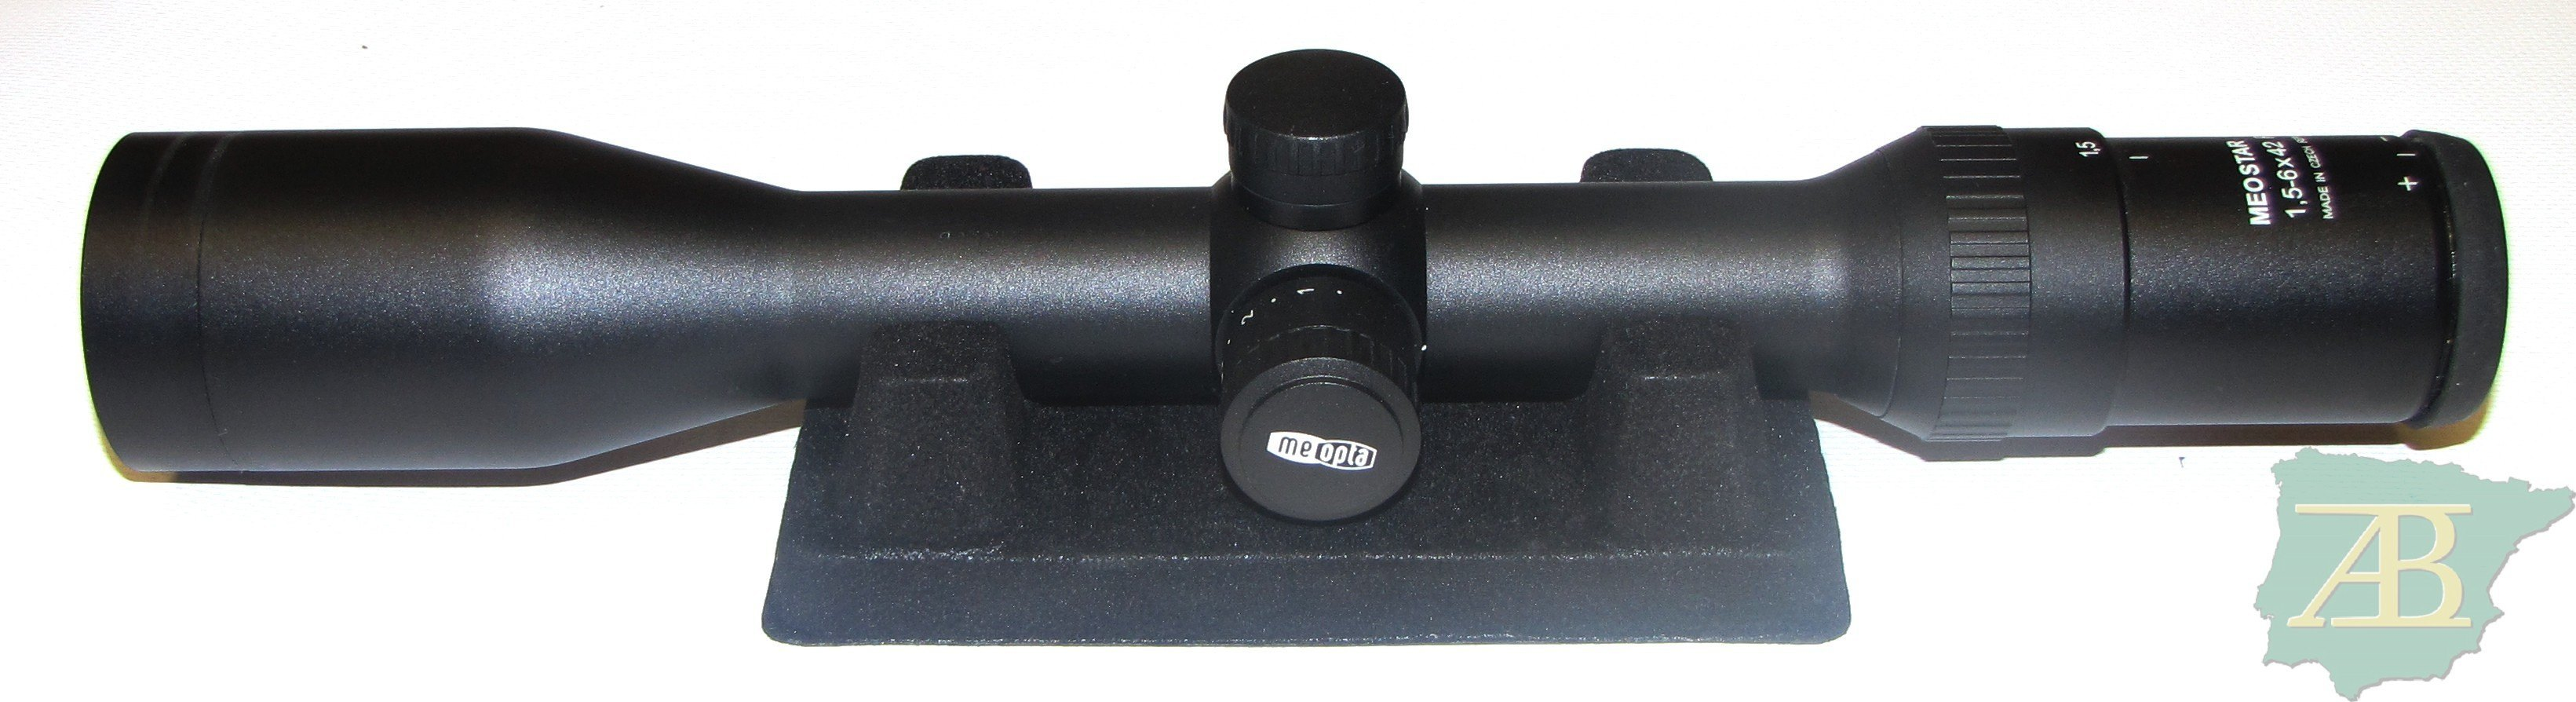 MEOPTA MEOSTAR R1 1.5-6X42 RD